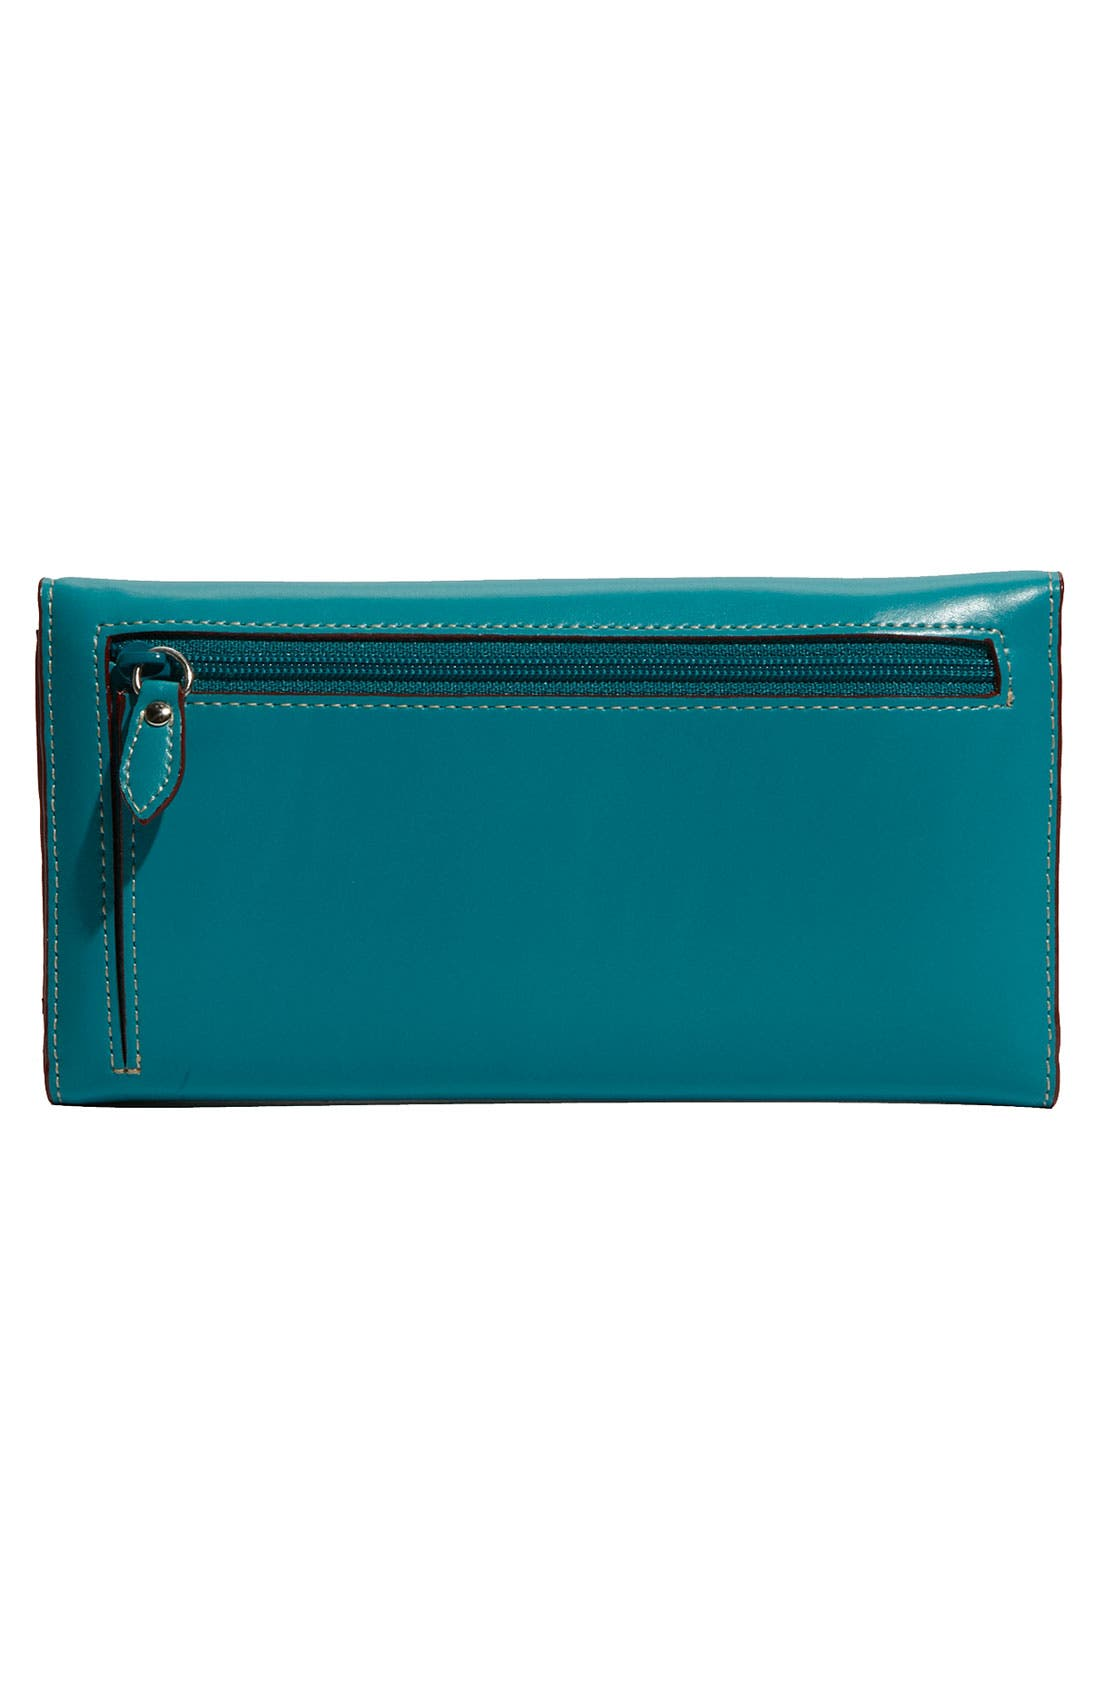 Lodis 'Audrey' Checkbook Clutch Wallet,                             Alternate thumbnail 4, color,                             Teal/ Merlot